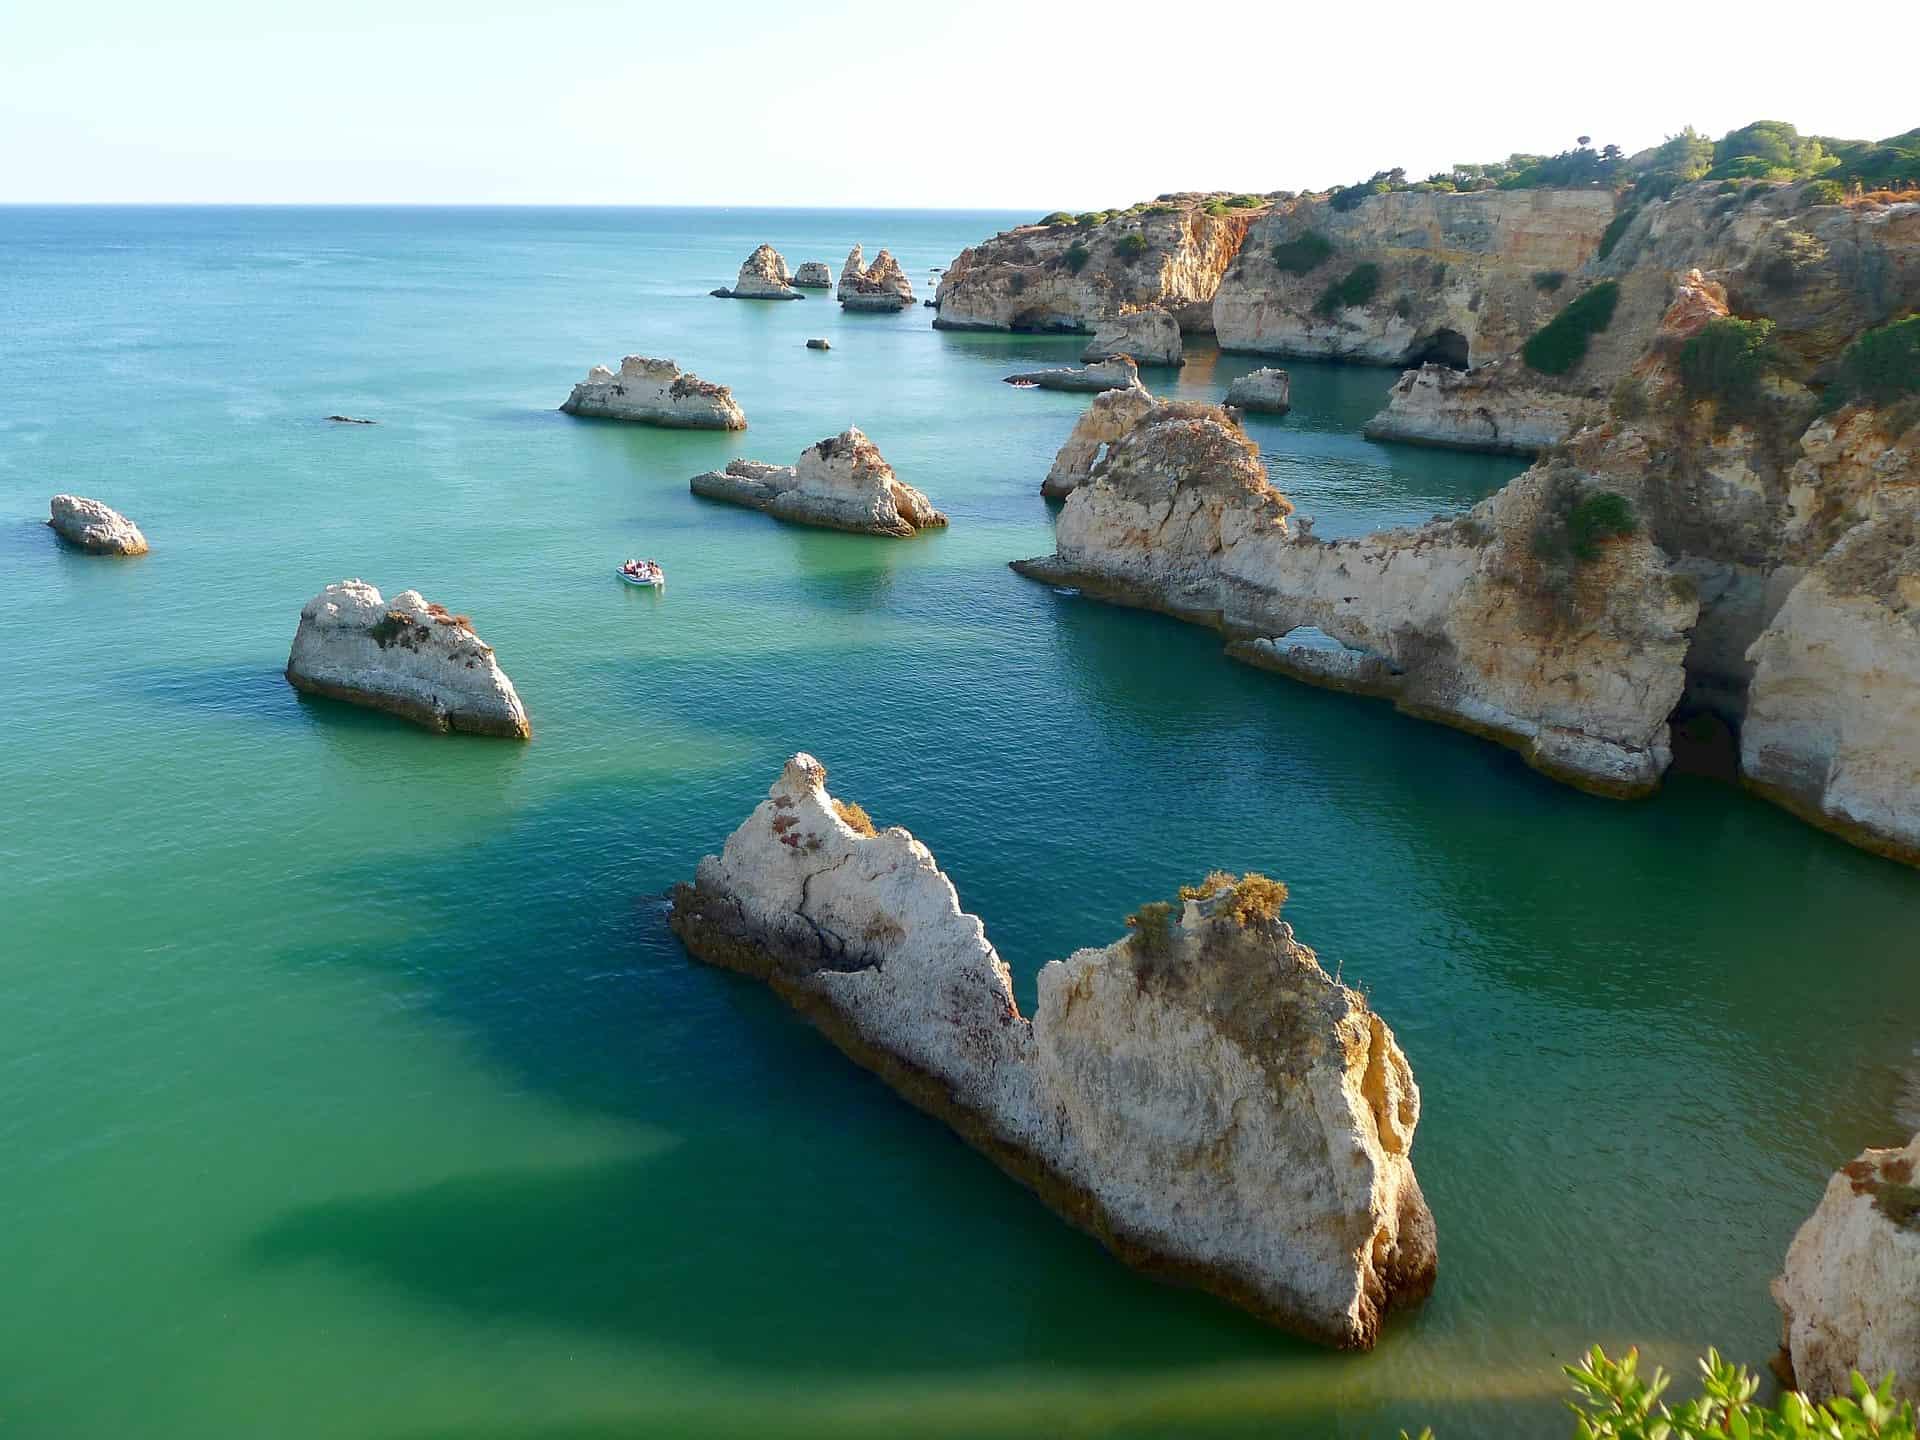 Algarve Deal - Urlaub ab 146,22€ Reise an die Südküste Portugals